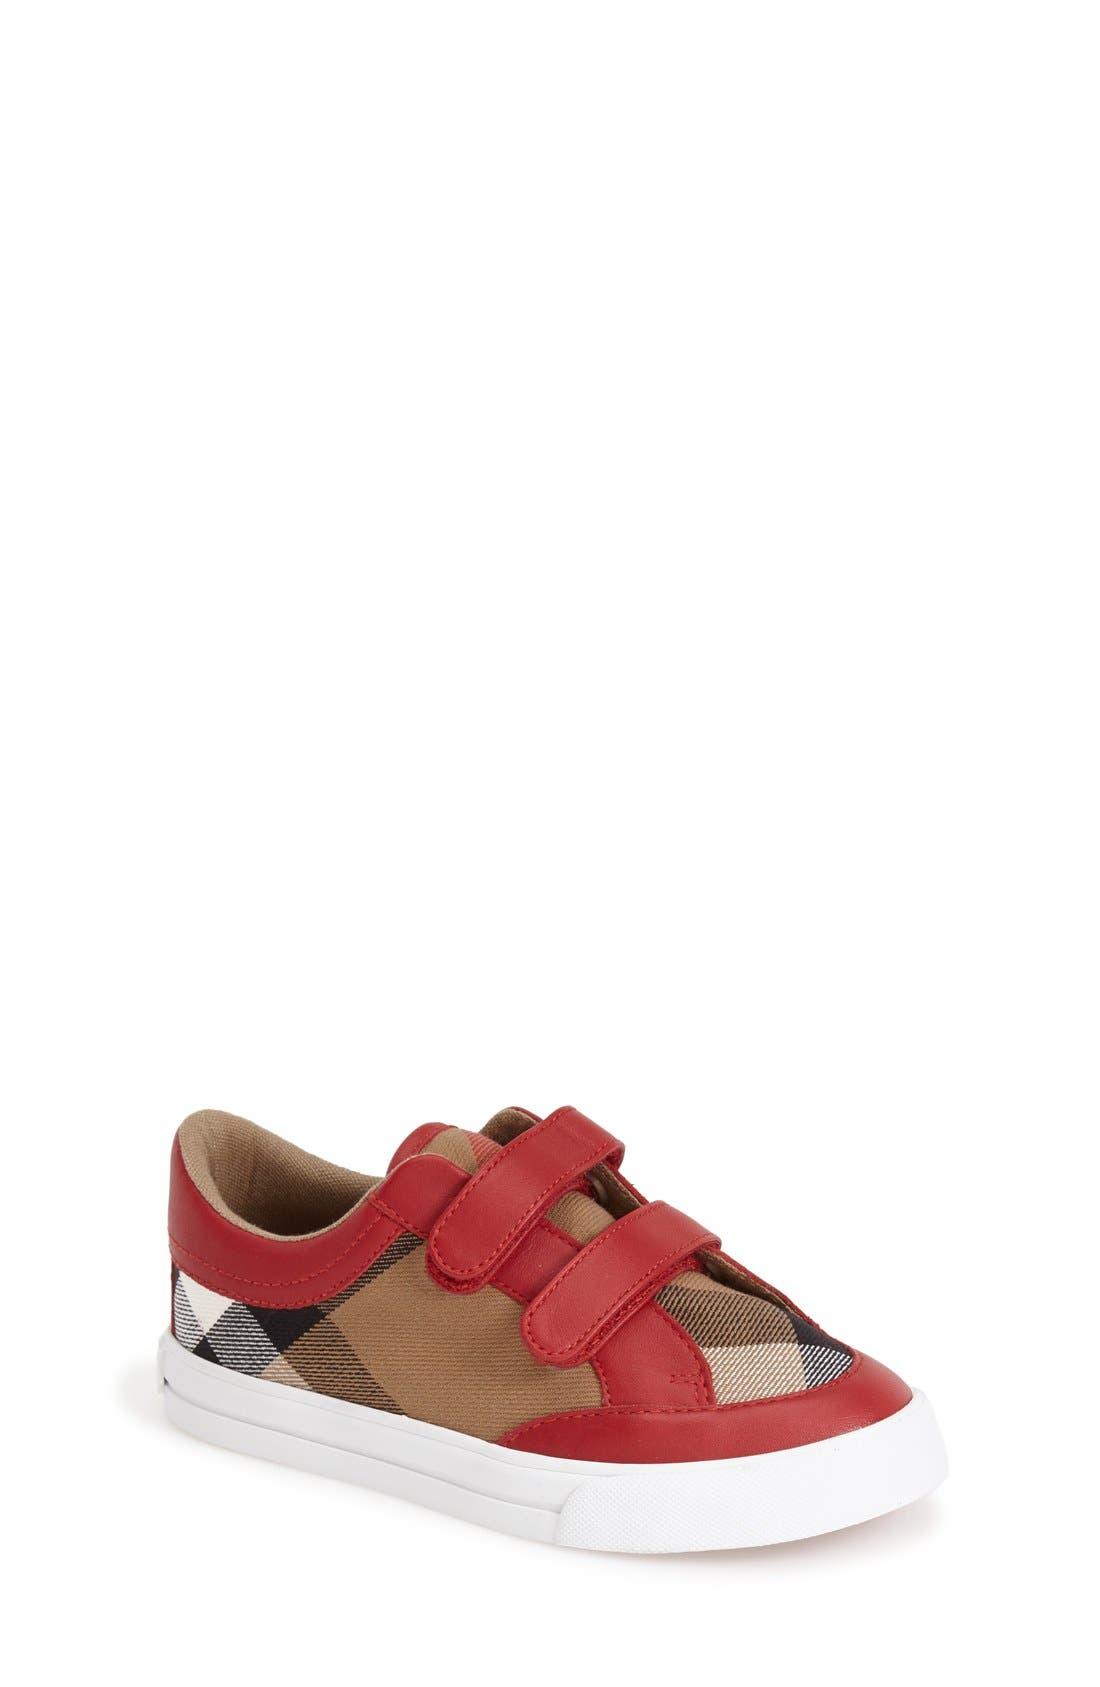 Mini Heacham Sneaker,                             Main thumbnail 1, color,                             Parade Red